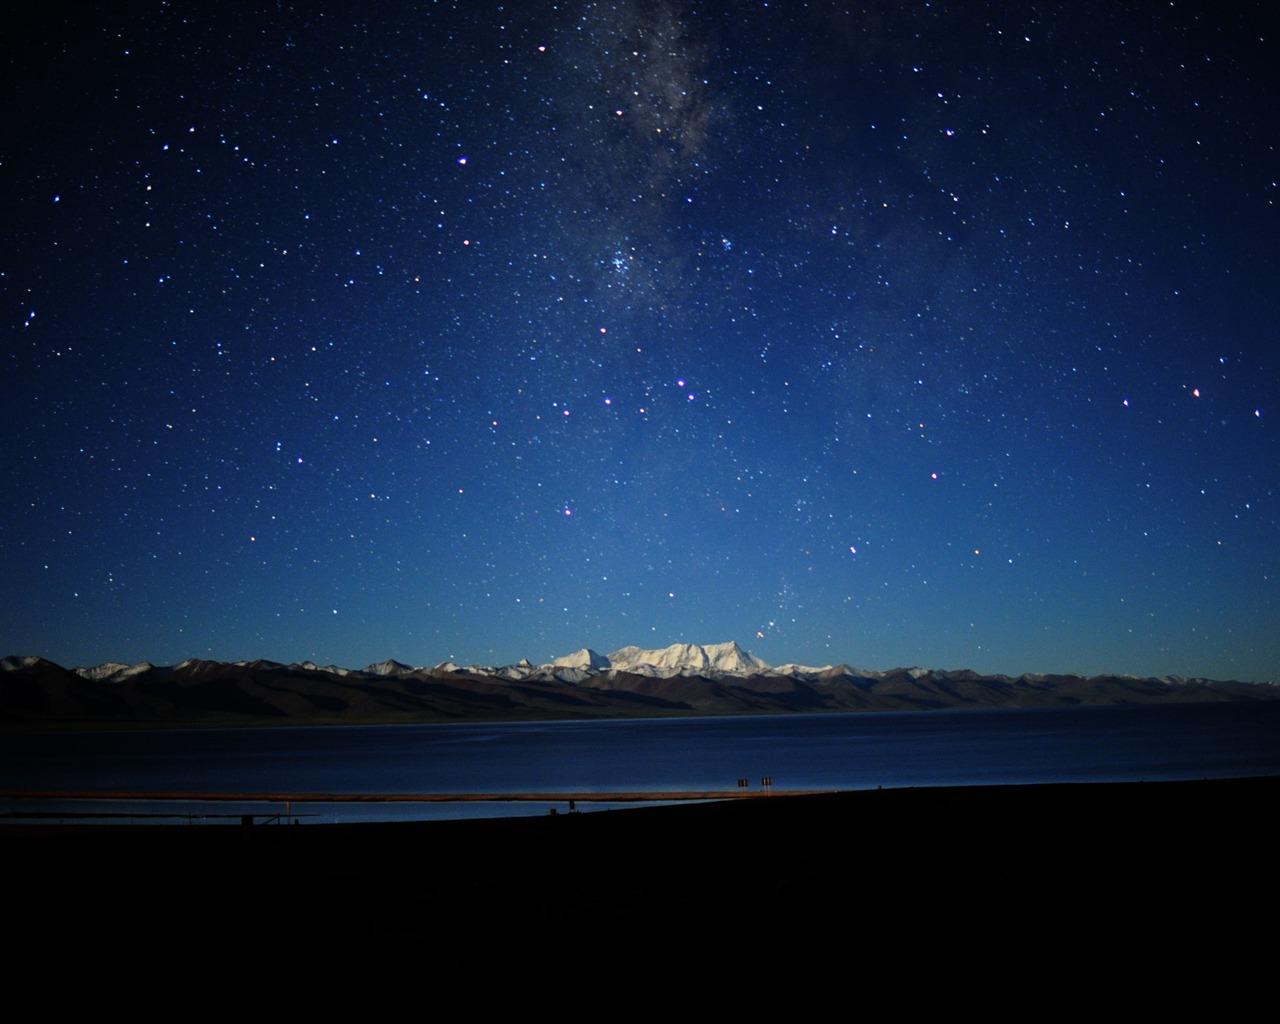 The night sky in Tibet-Natural Scenery Wallpaper - 1280x1024 wallpaper ...